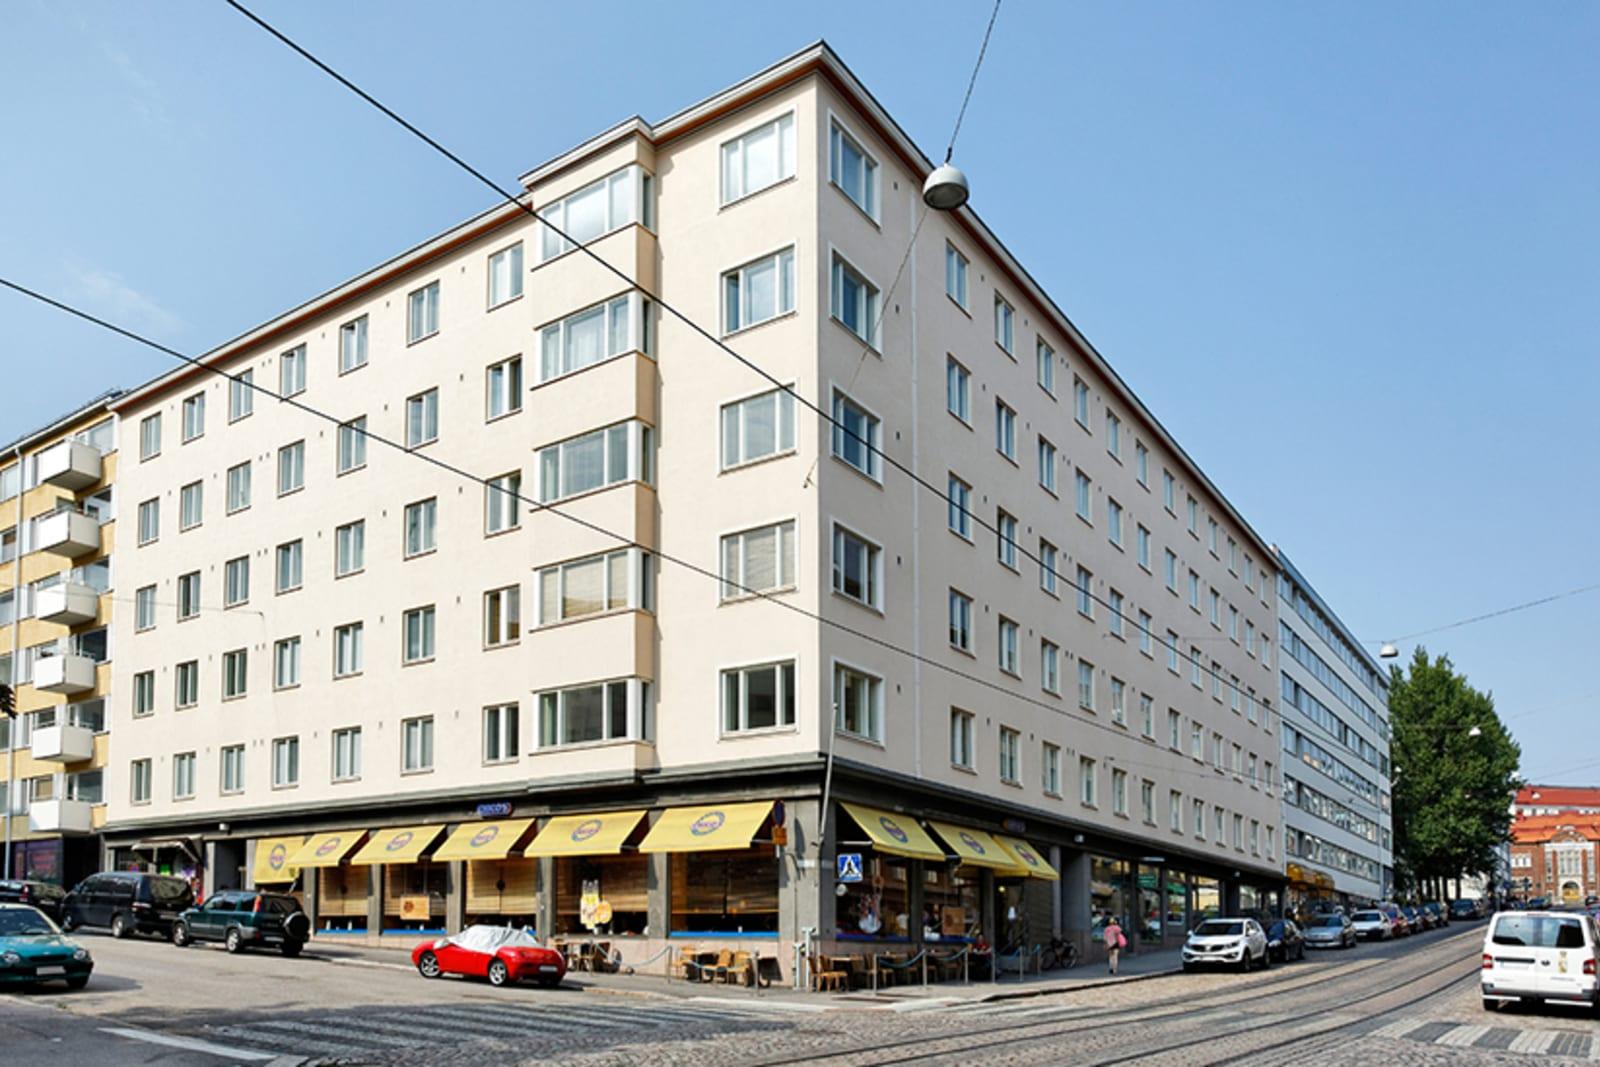 Helsinki, Kallio, Porthaninkatu 4, Kolmas linja 9